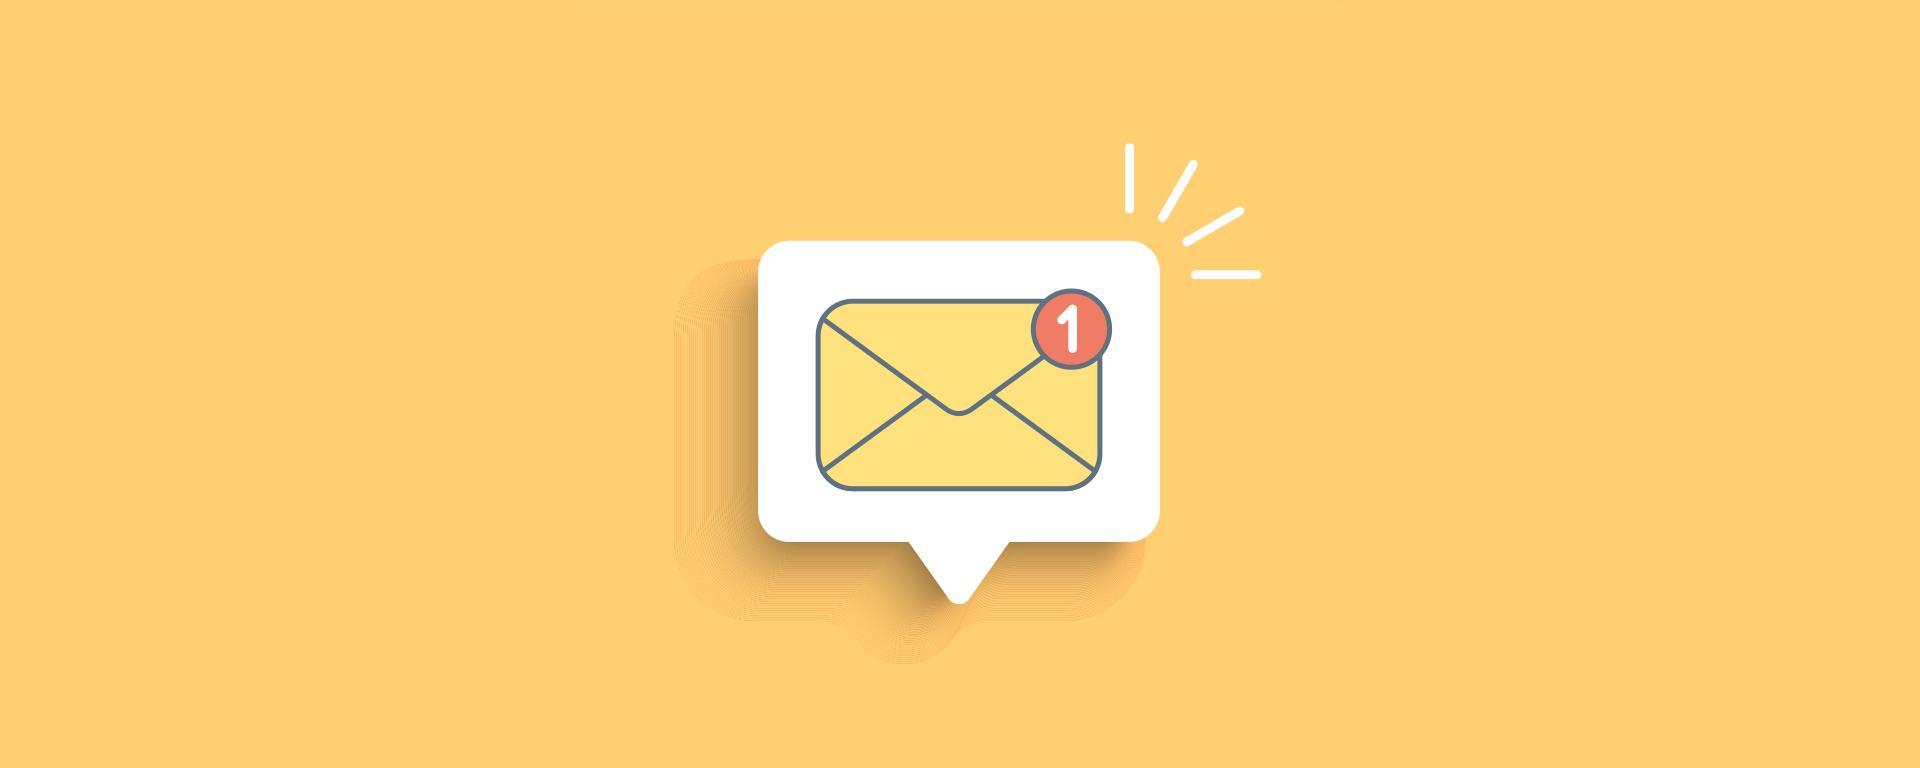 Market Mailbag: What Dangers Lurk Around the Corner? Thumbnail